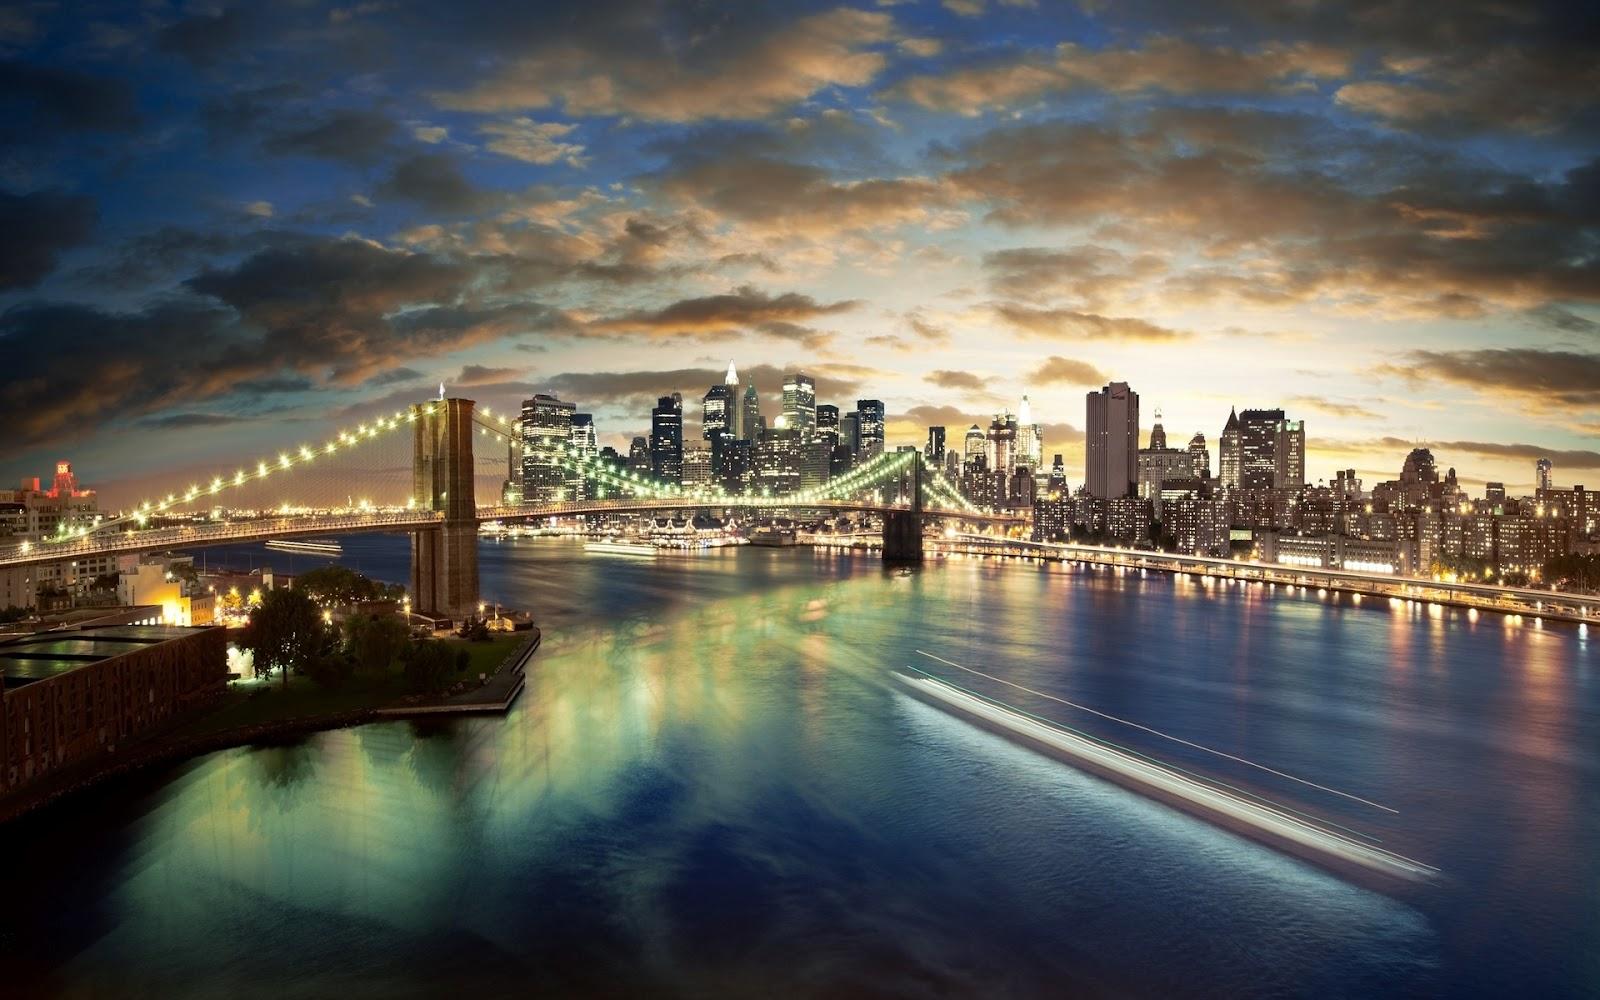 http://4.bp.blogspot.com/-__IX5tQHe_s/T2C_86kKCfI/AAAAAAAAWfY/MT2YBLGWnTs/s1600/Puente-de-Brooklyn-NYC_Brooklyn-Bridge_06.jpg